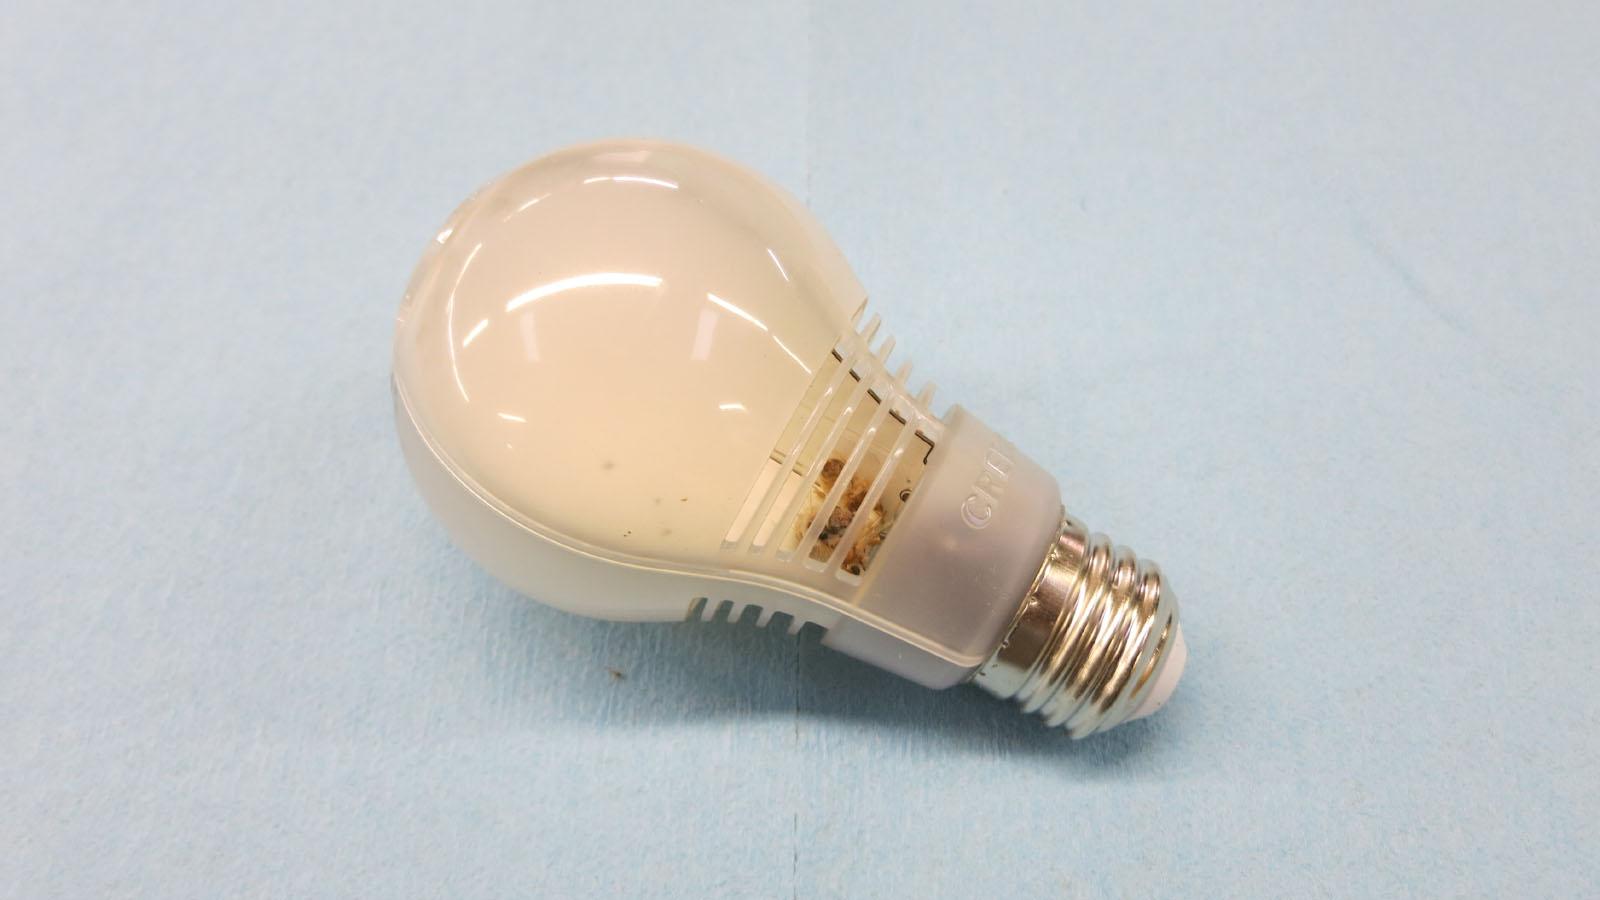 Cree LED bulb teardown 1 - intact